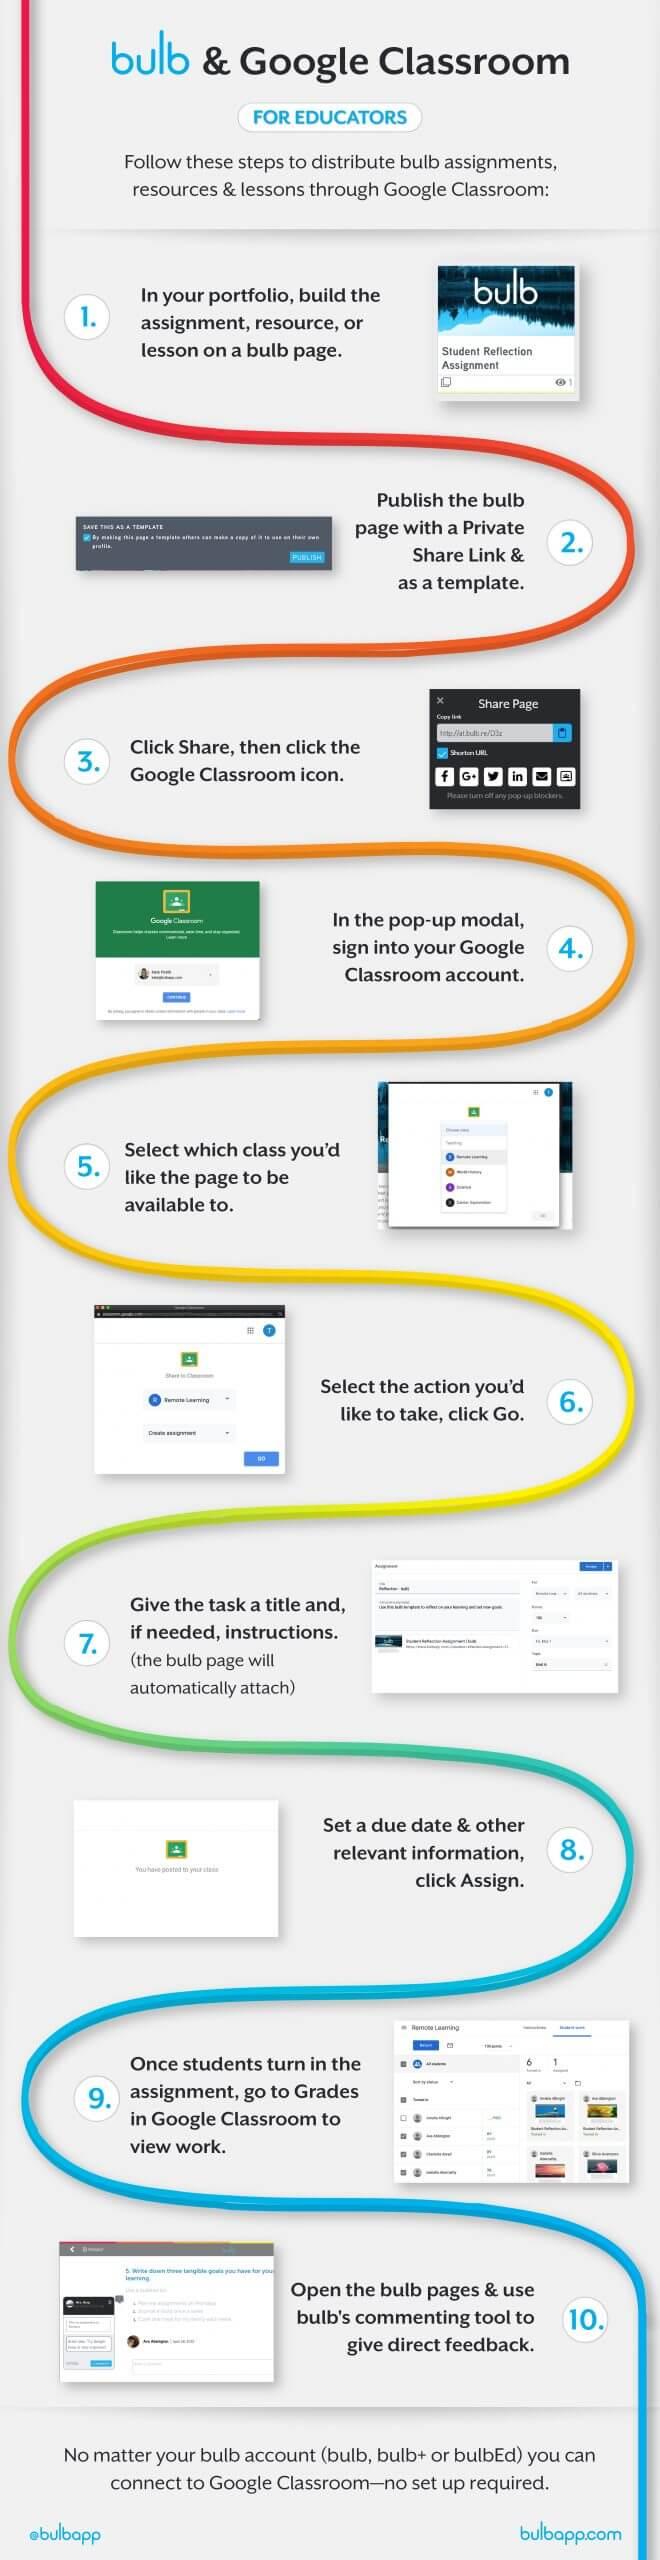 bulb Google Classroom Infographic